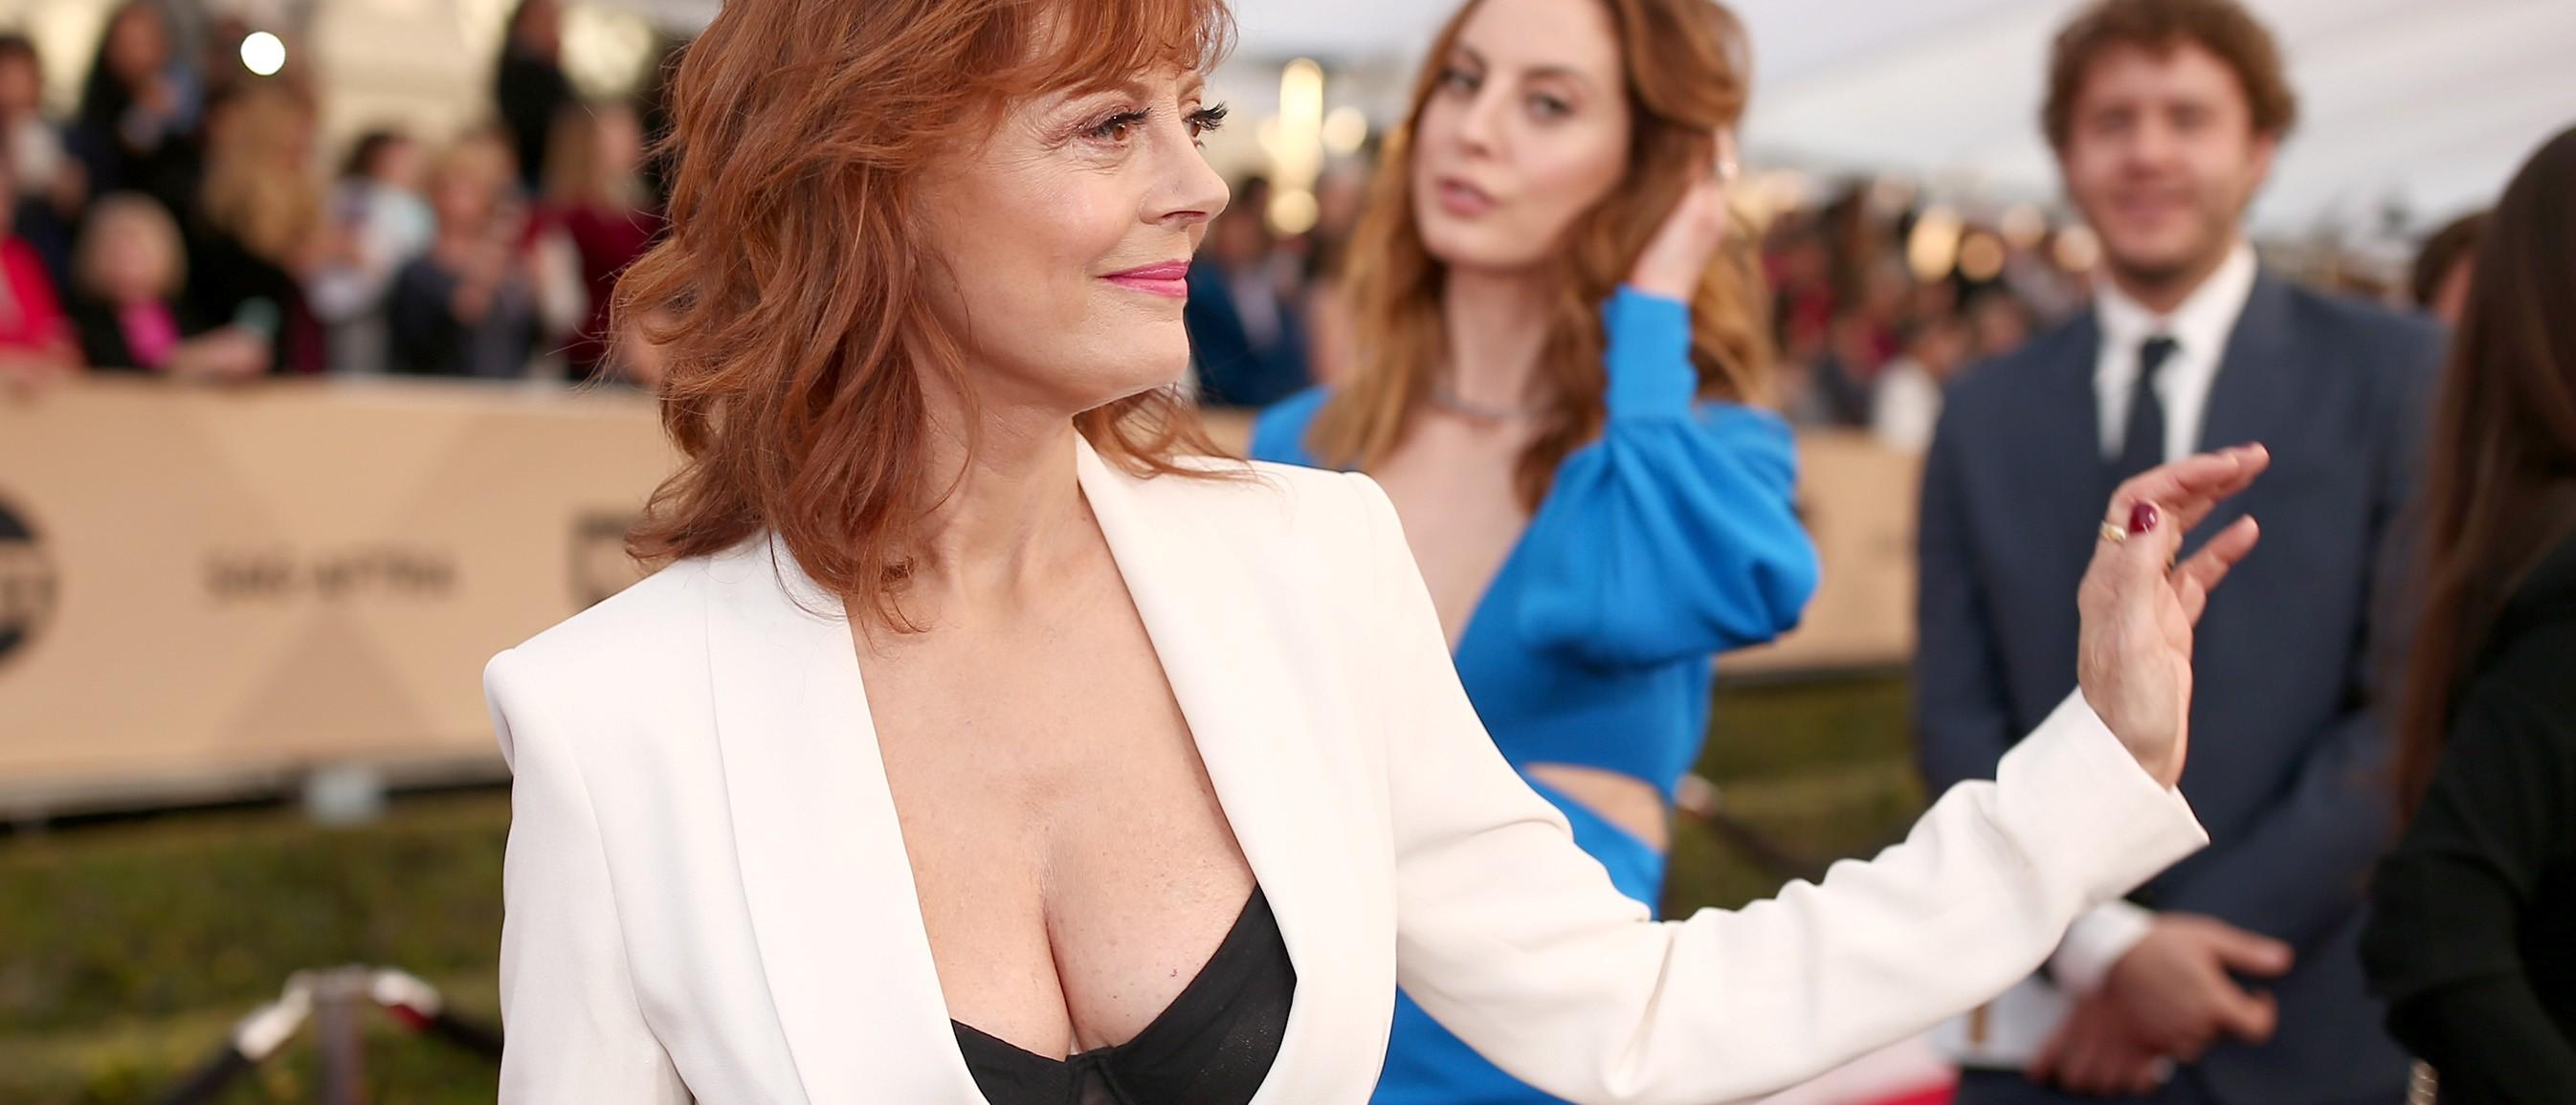 Susan Sarandon shows off cleavage